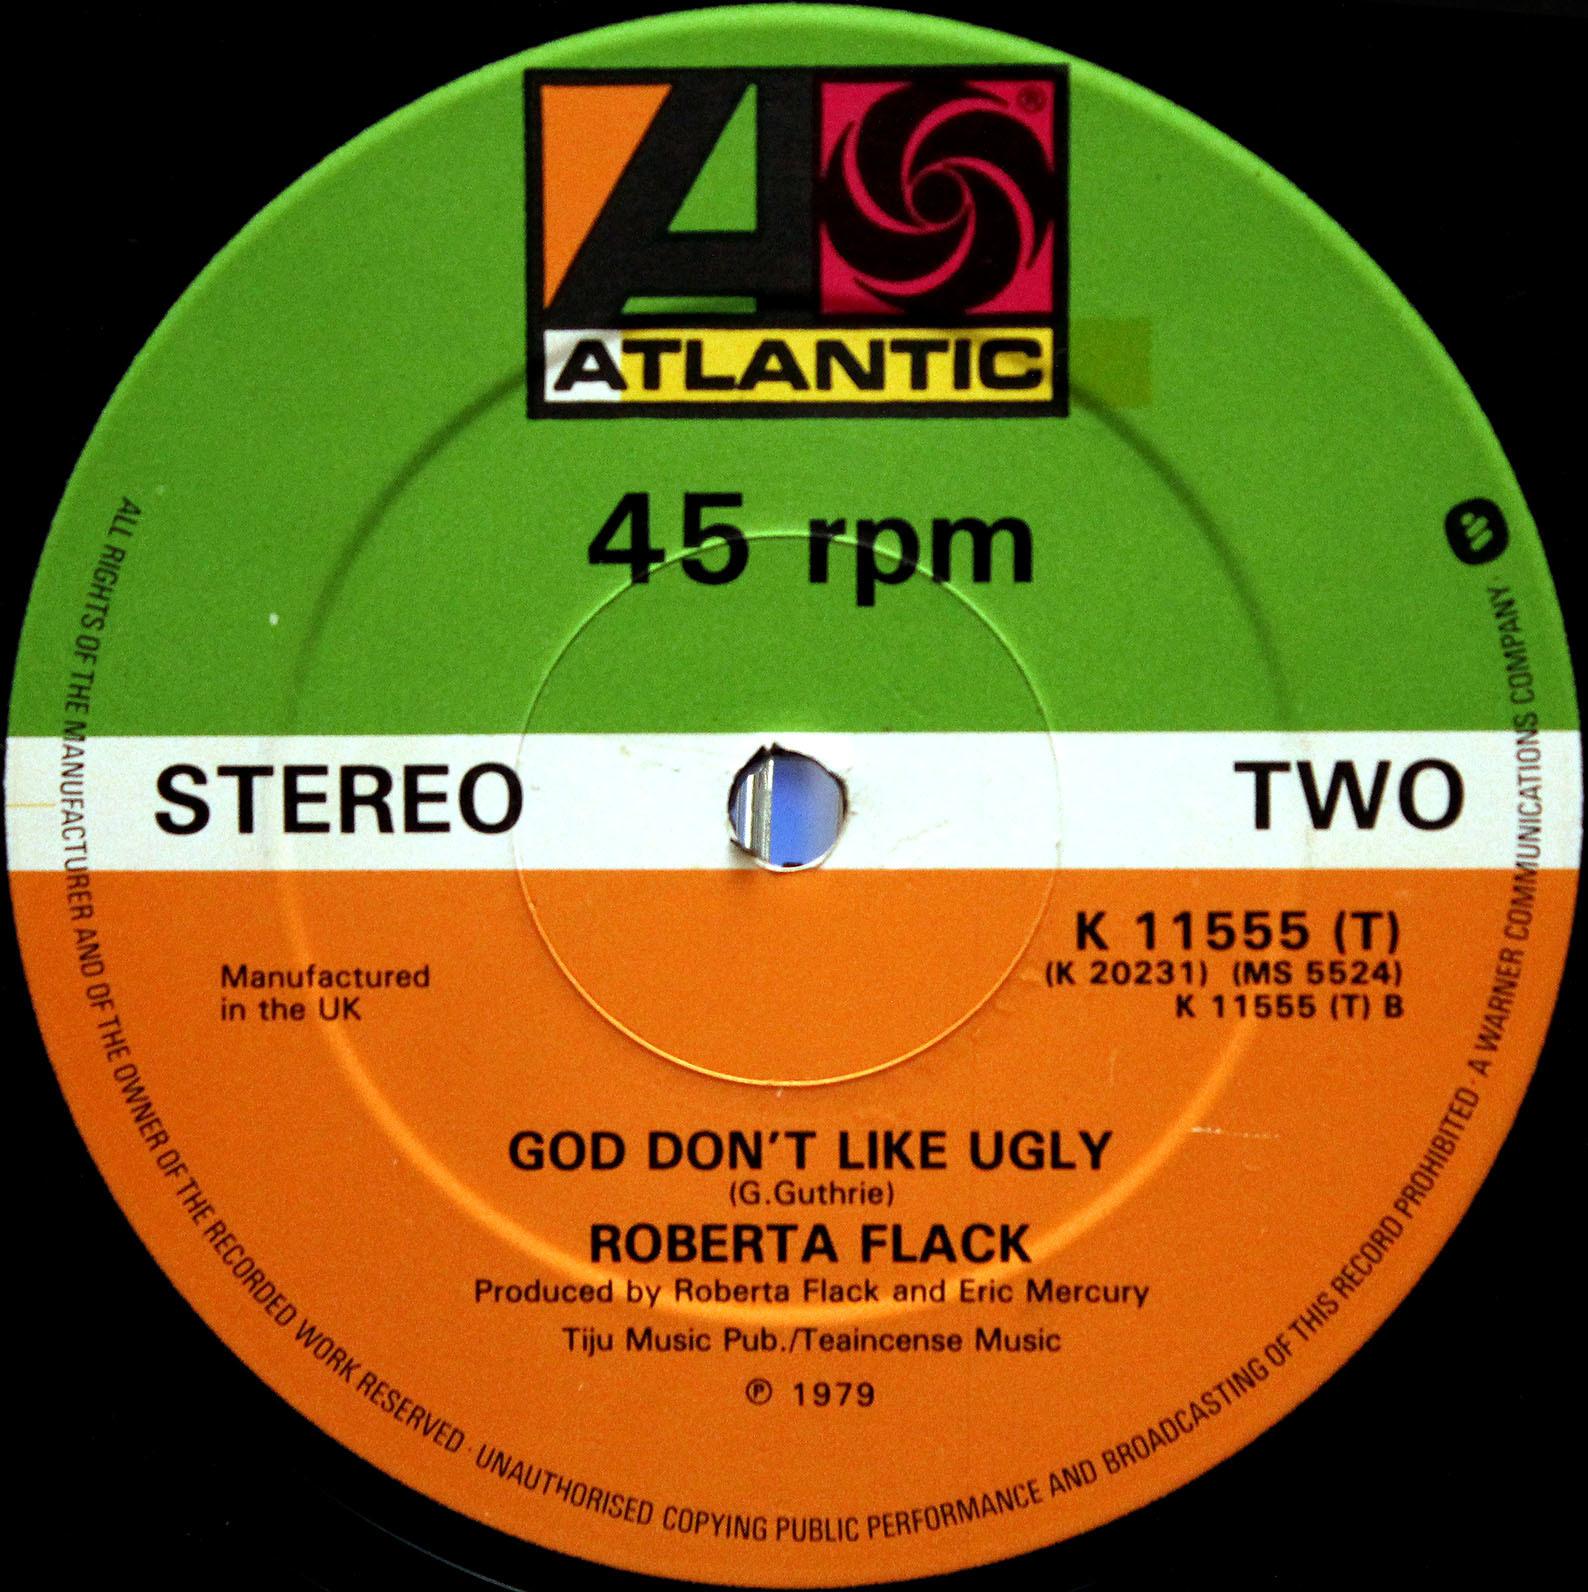 Roberta Flack – Dont Make Me Wait Too Long 04